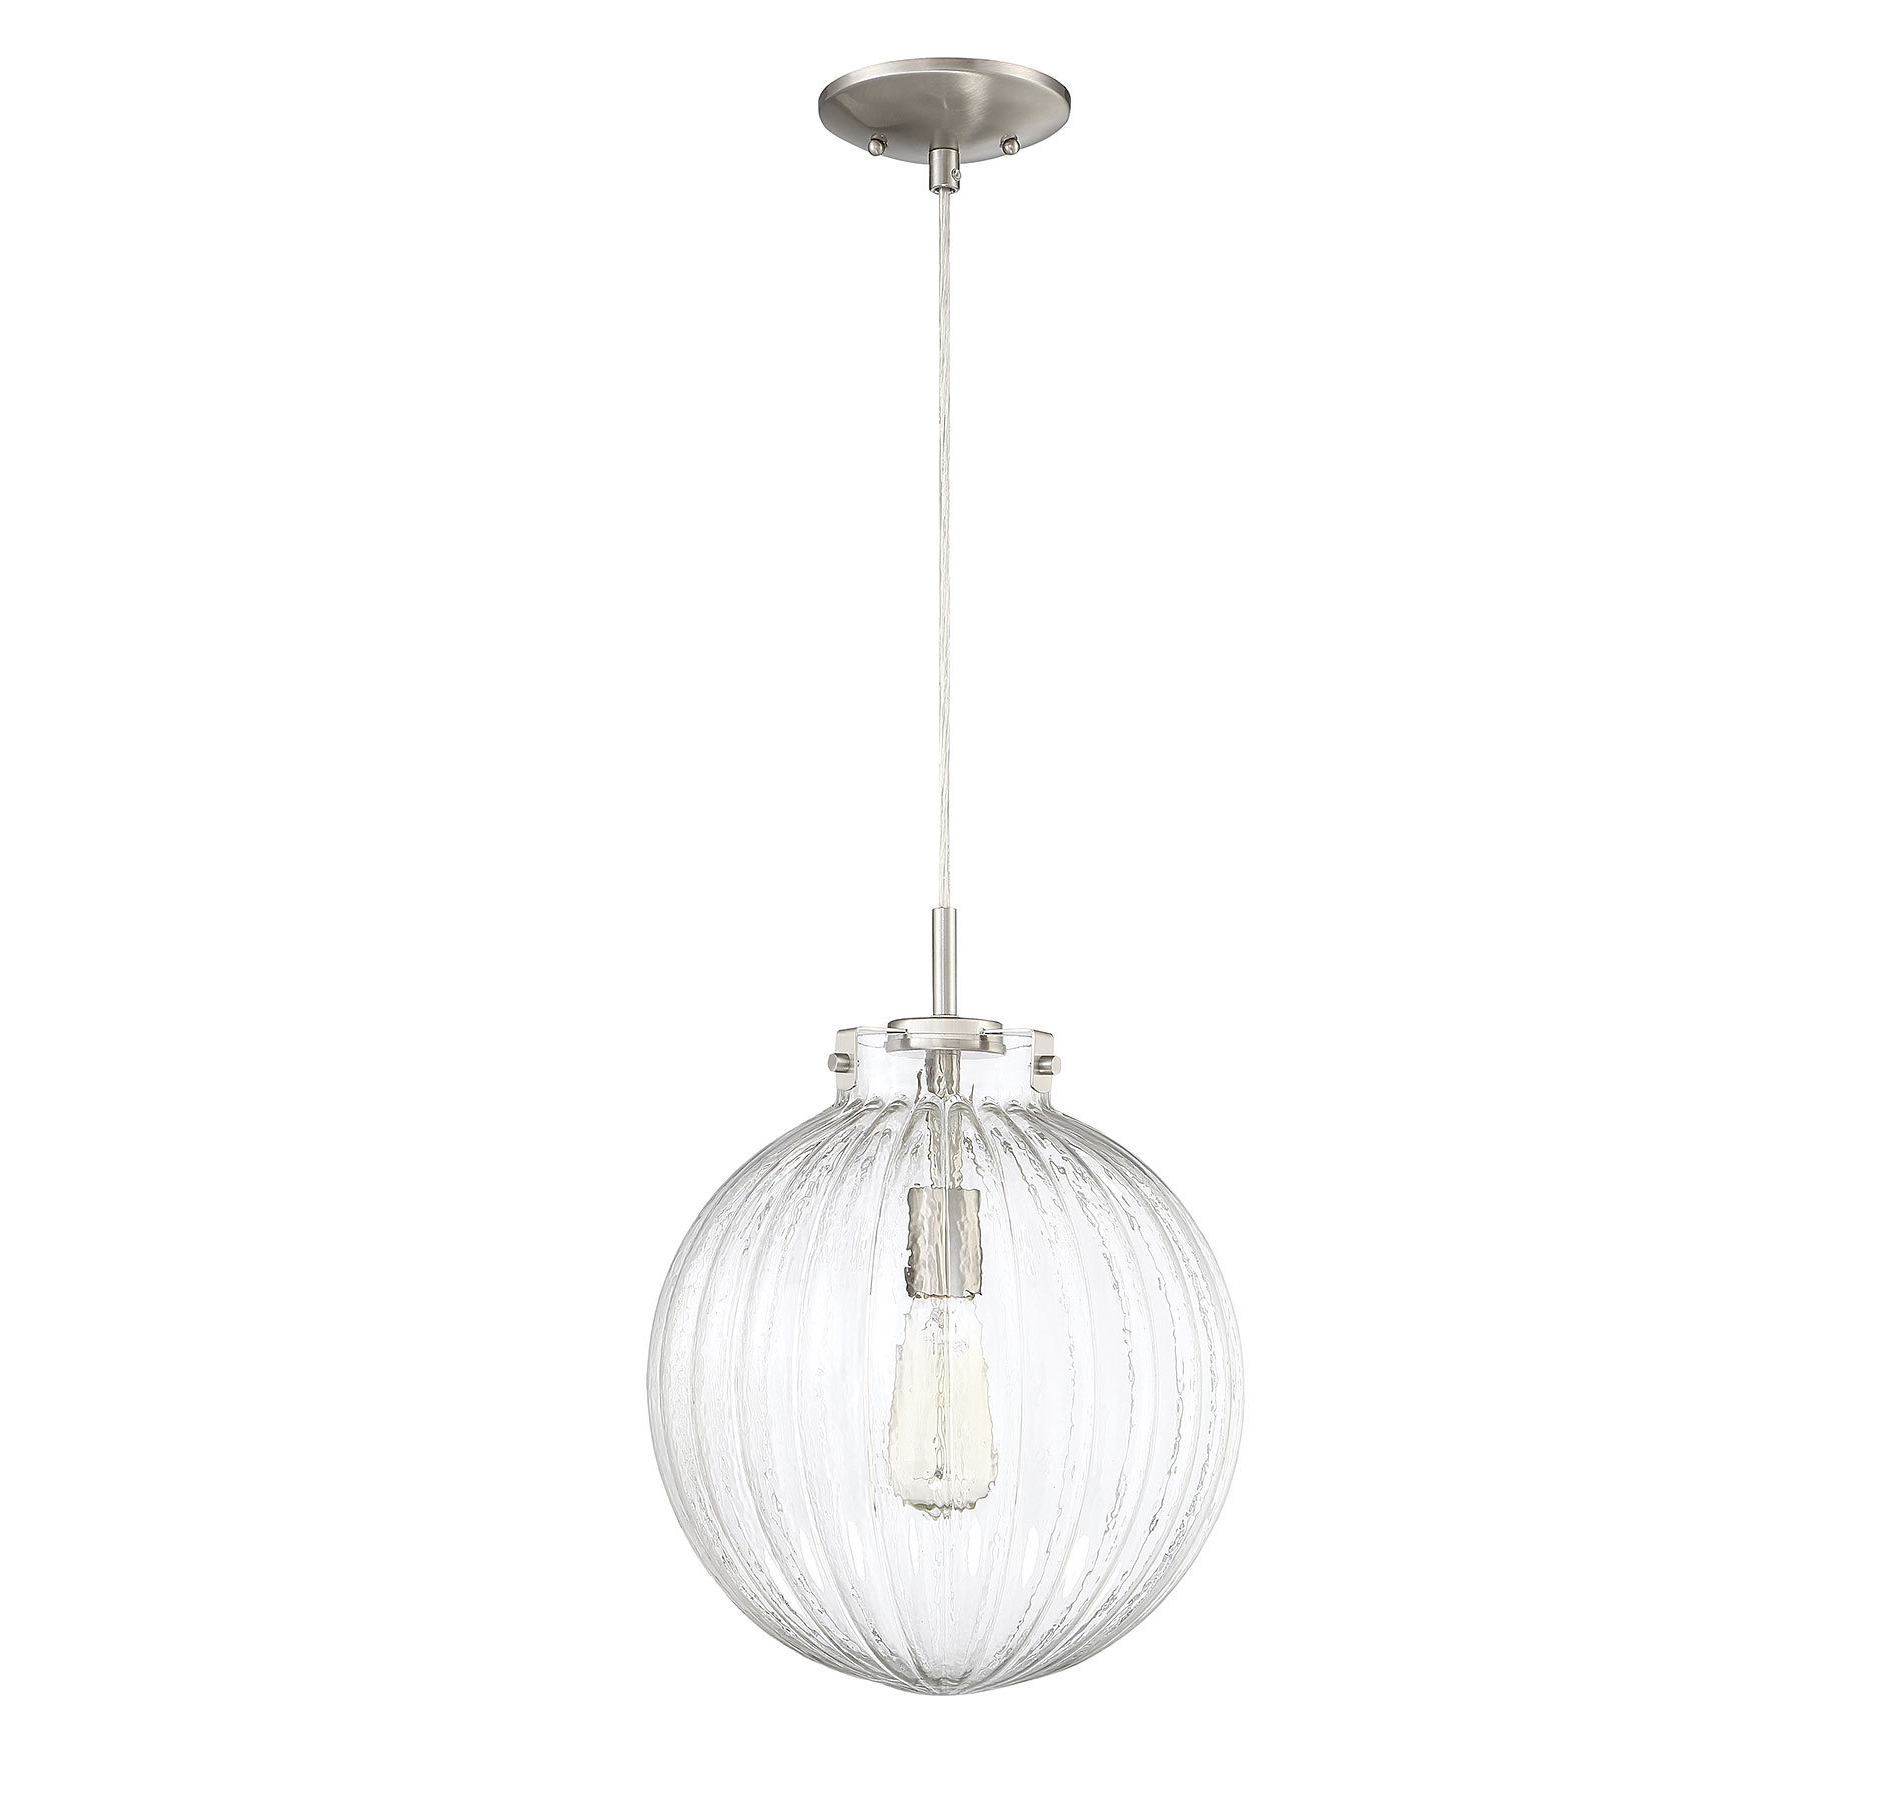 Nevels 1 Light Single Globe Pendant Regarding Fashionable 1 Light Geometric Globe Pendants (View 15 of 25)